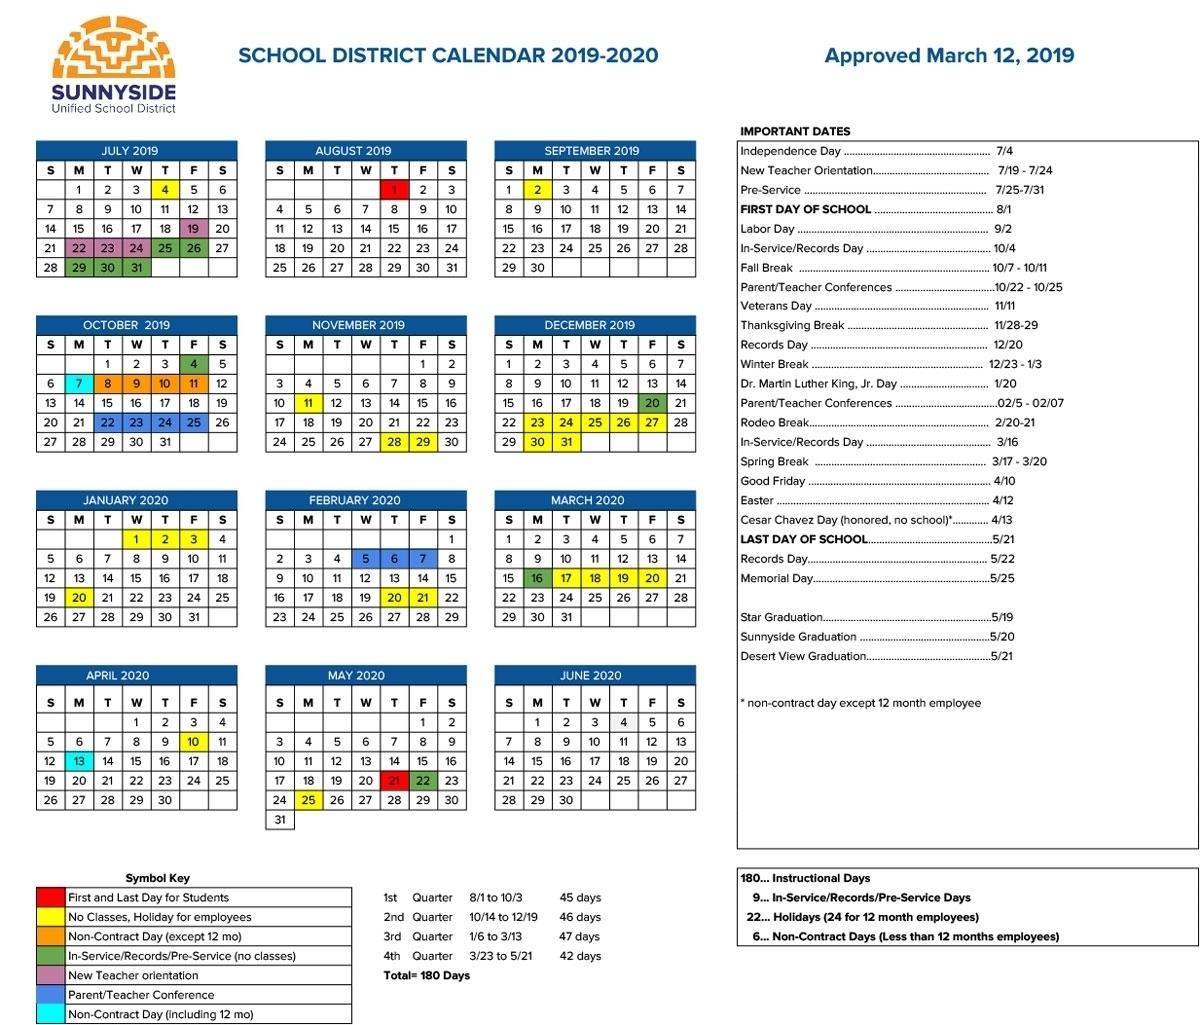 Special Daysmonth In 2020 - Calendar Inspiration Design